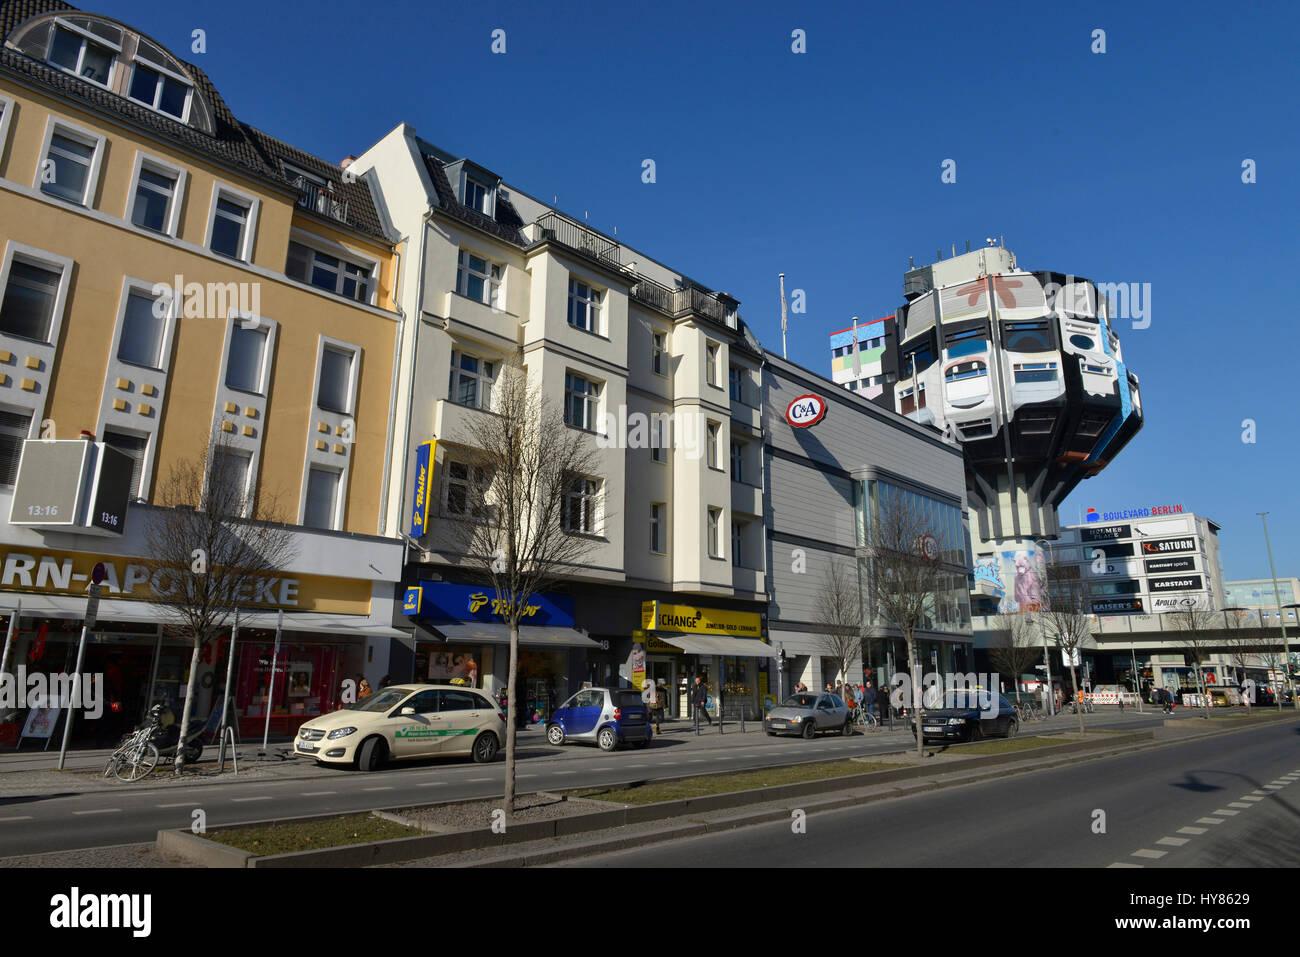 Schlossstrasse, Steglitz, Berlin, Germany, Deutschland - Stock Image